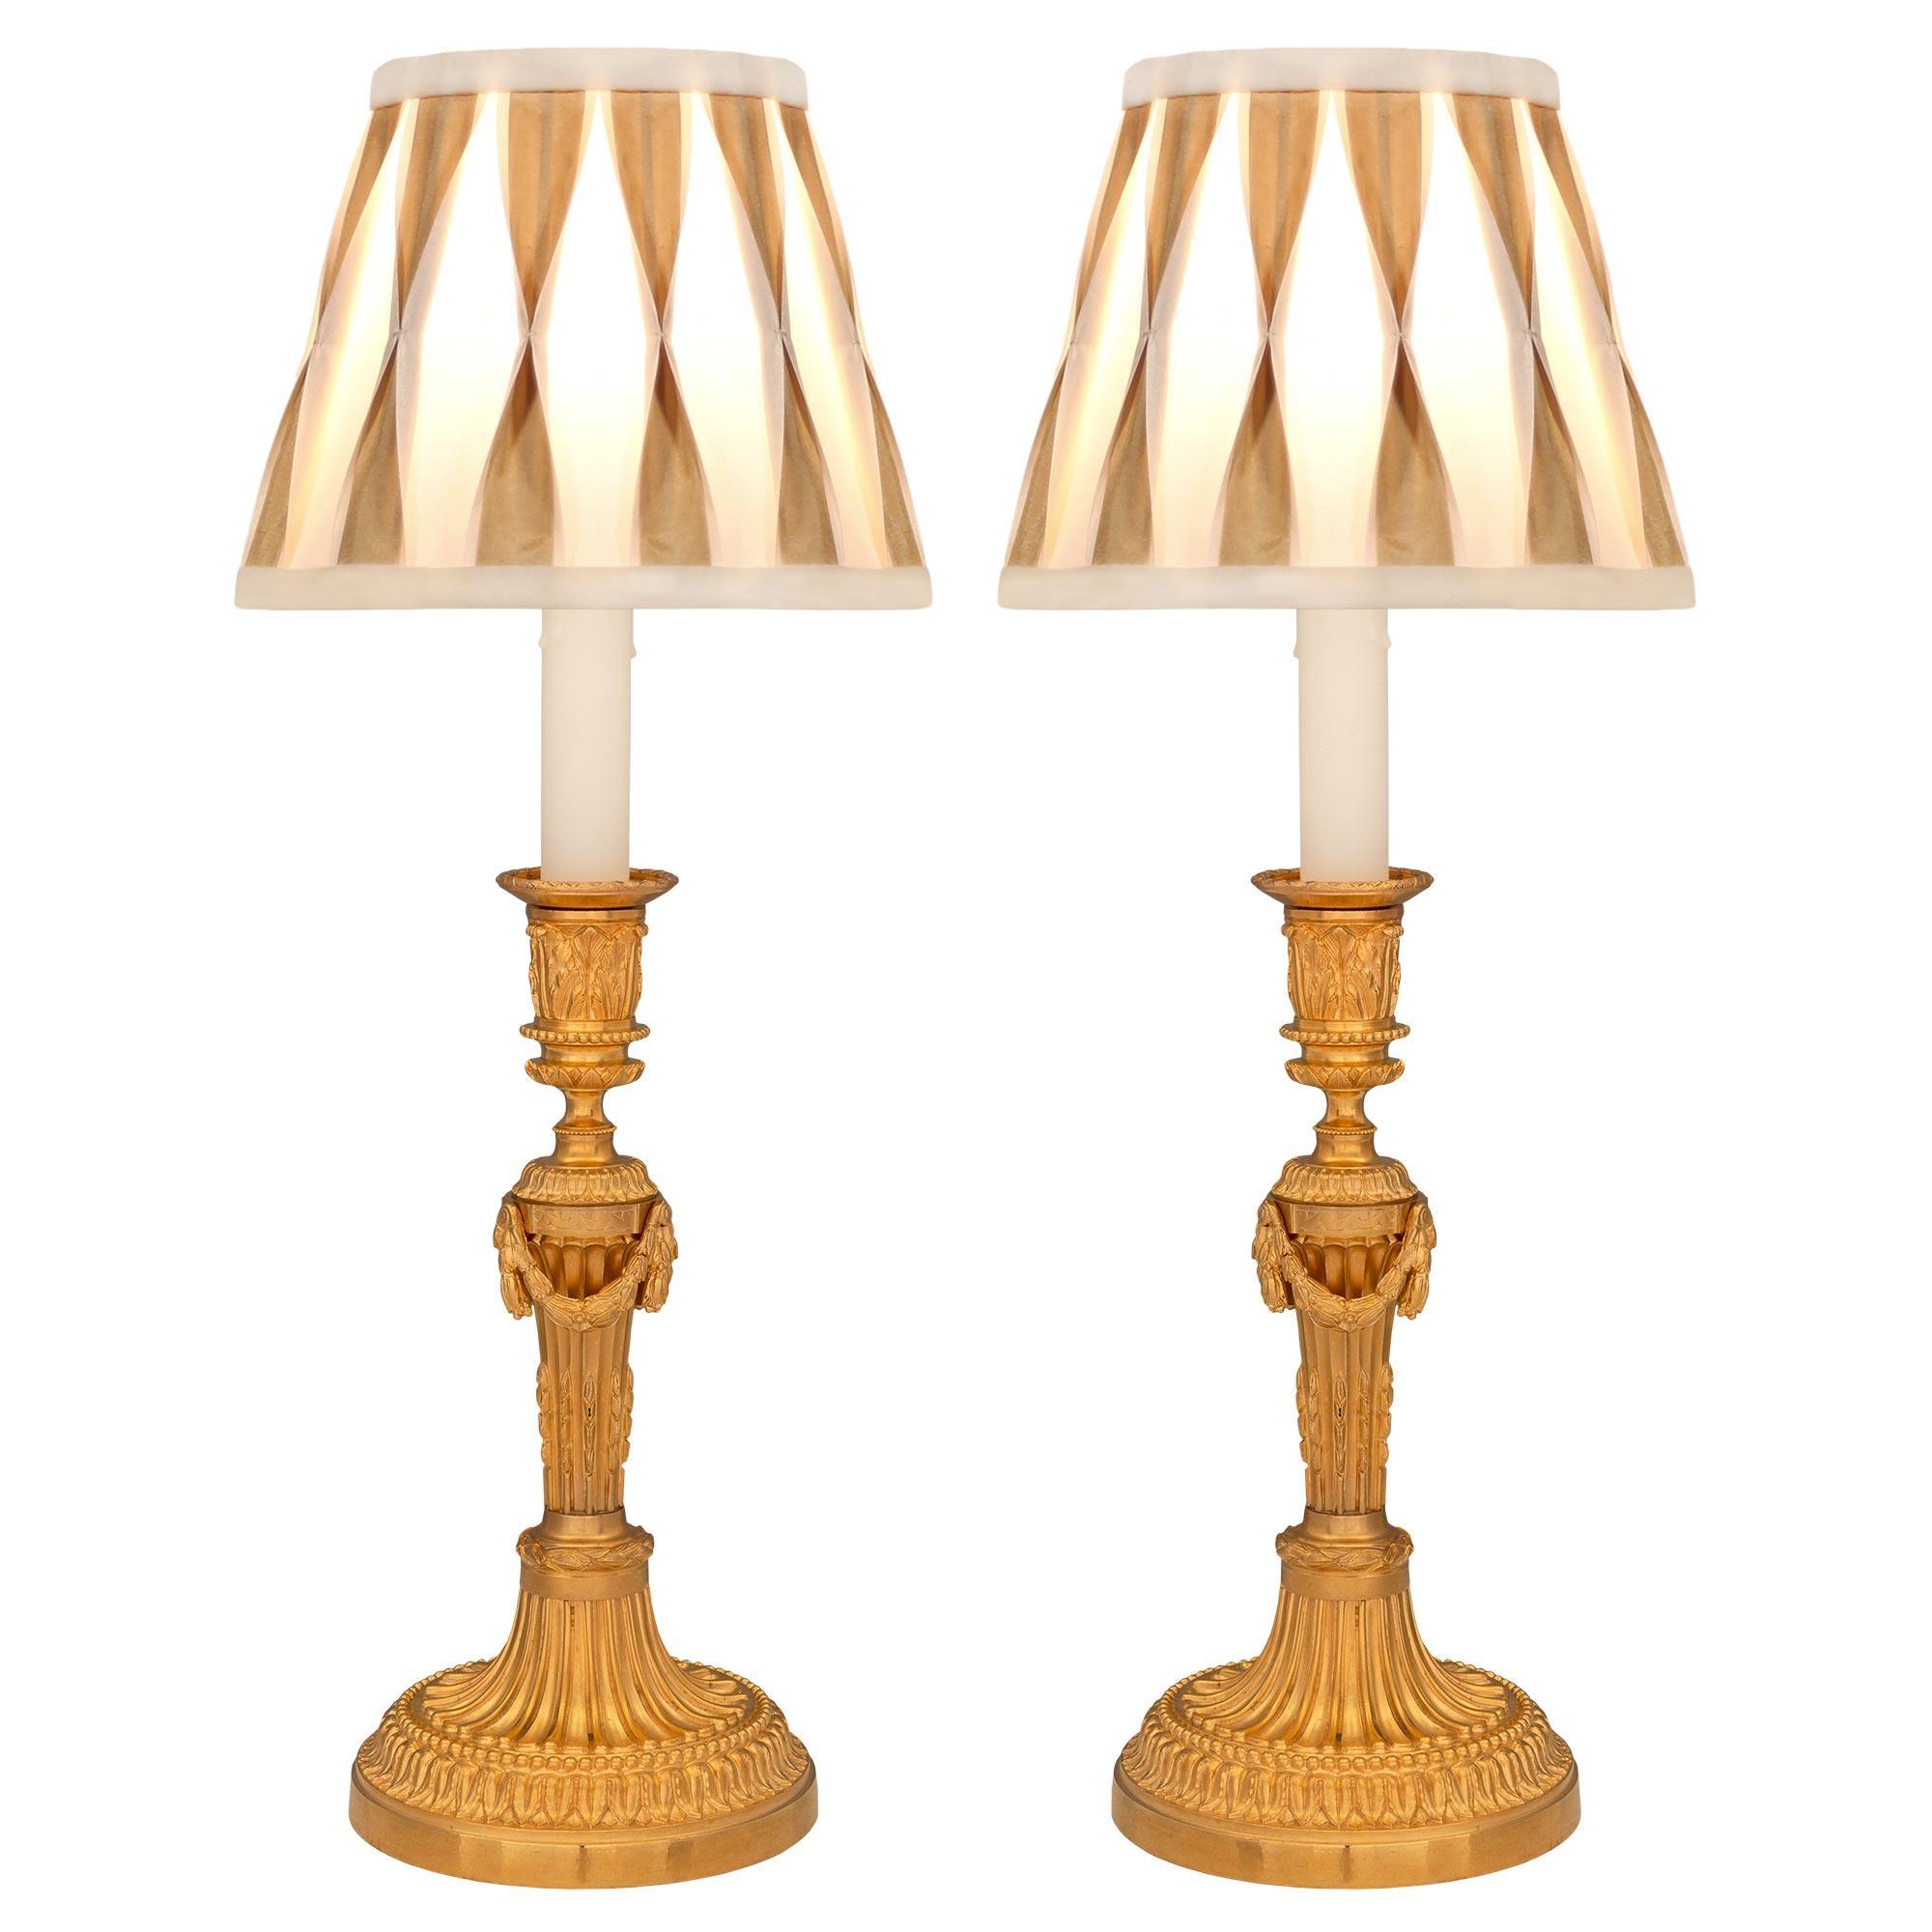 Pair of French 19th Century Louis XVI St. Ormolu Lamps